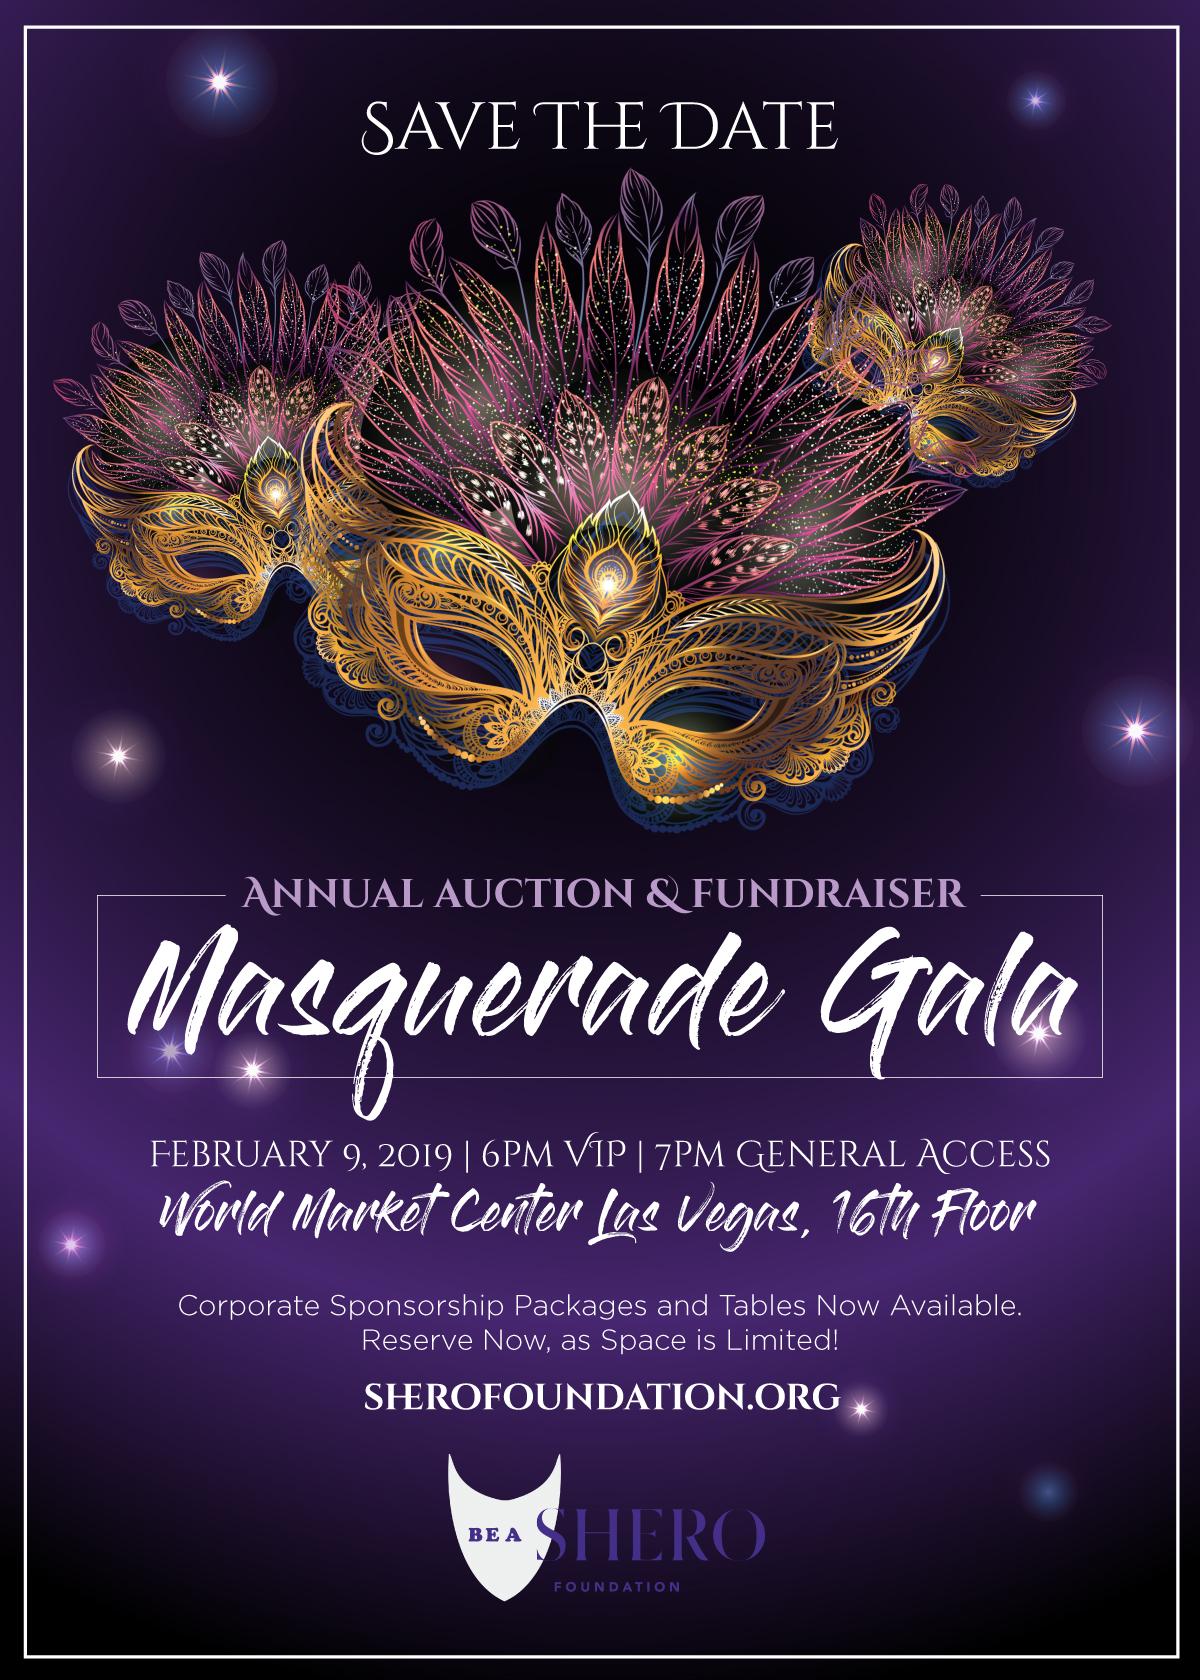 f7fd5a3cea Masquerade Gala 2019 - SHERO Foundation